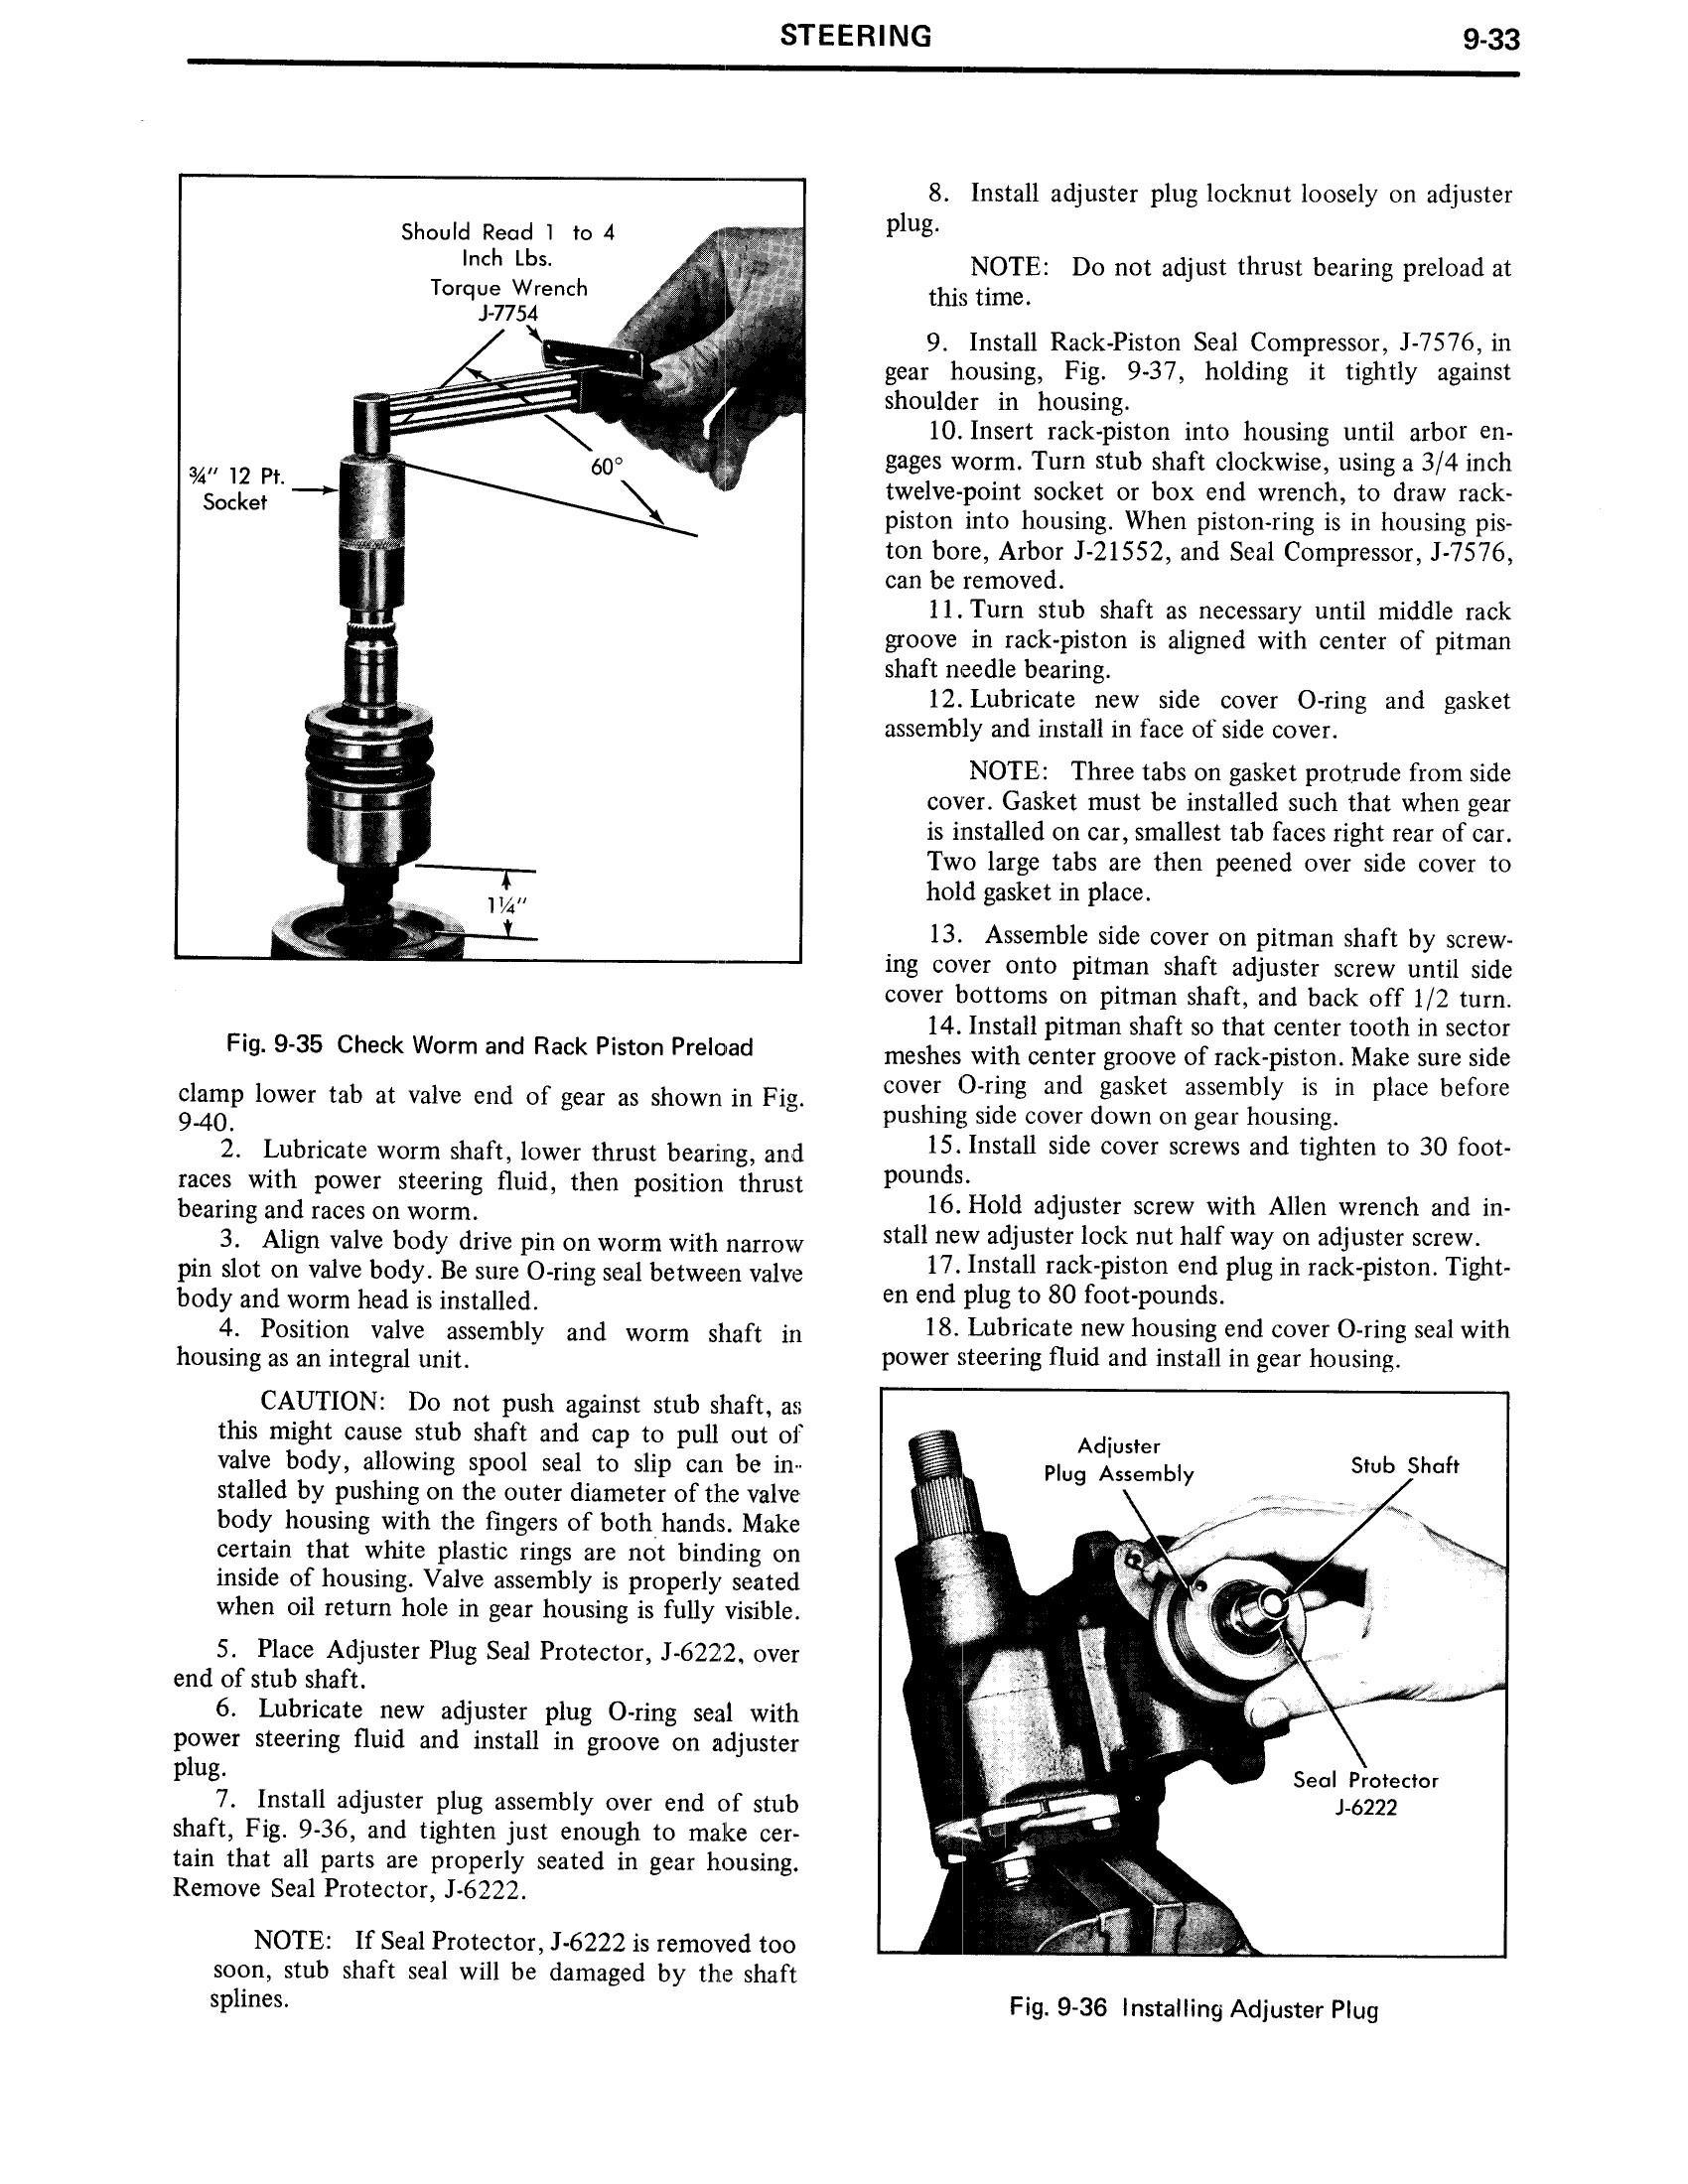 1971 Cadillac Shop Manual- Steering Page 33 of 58